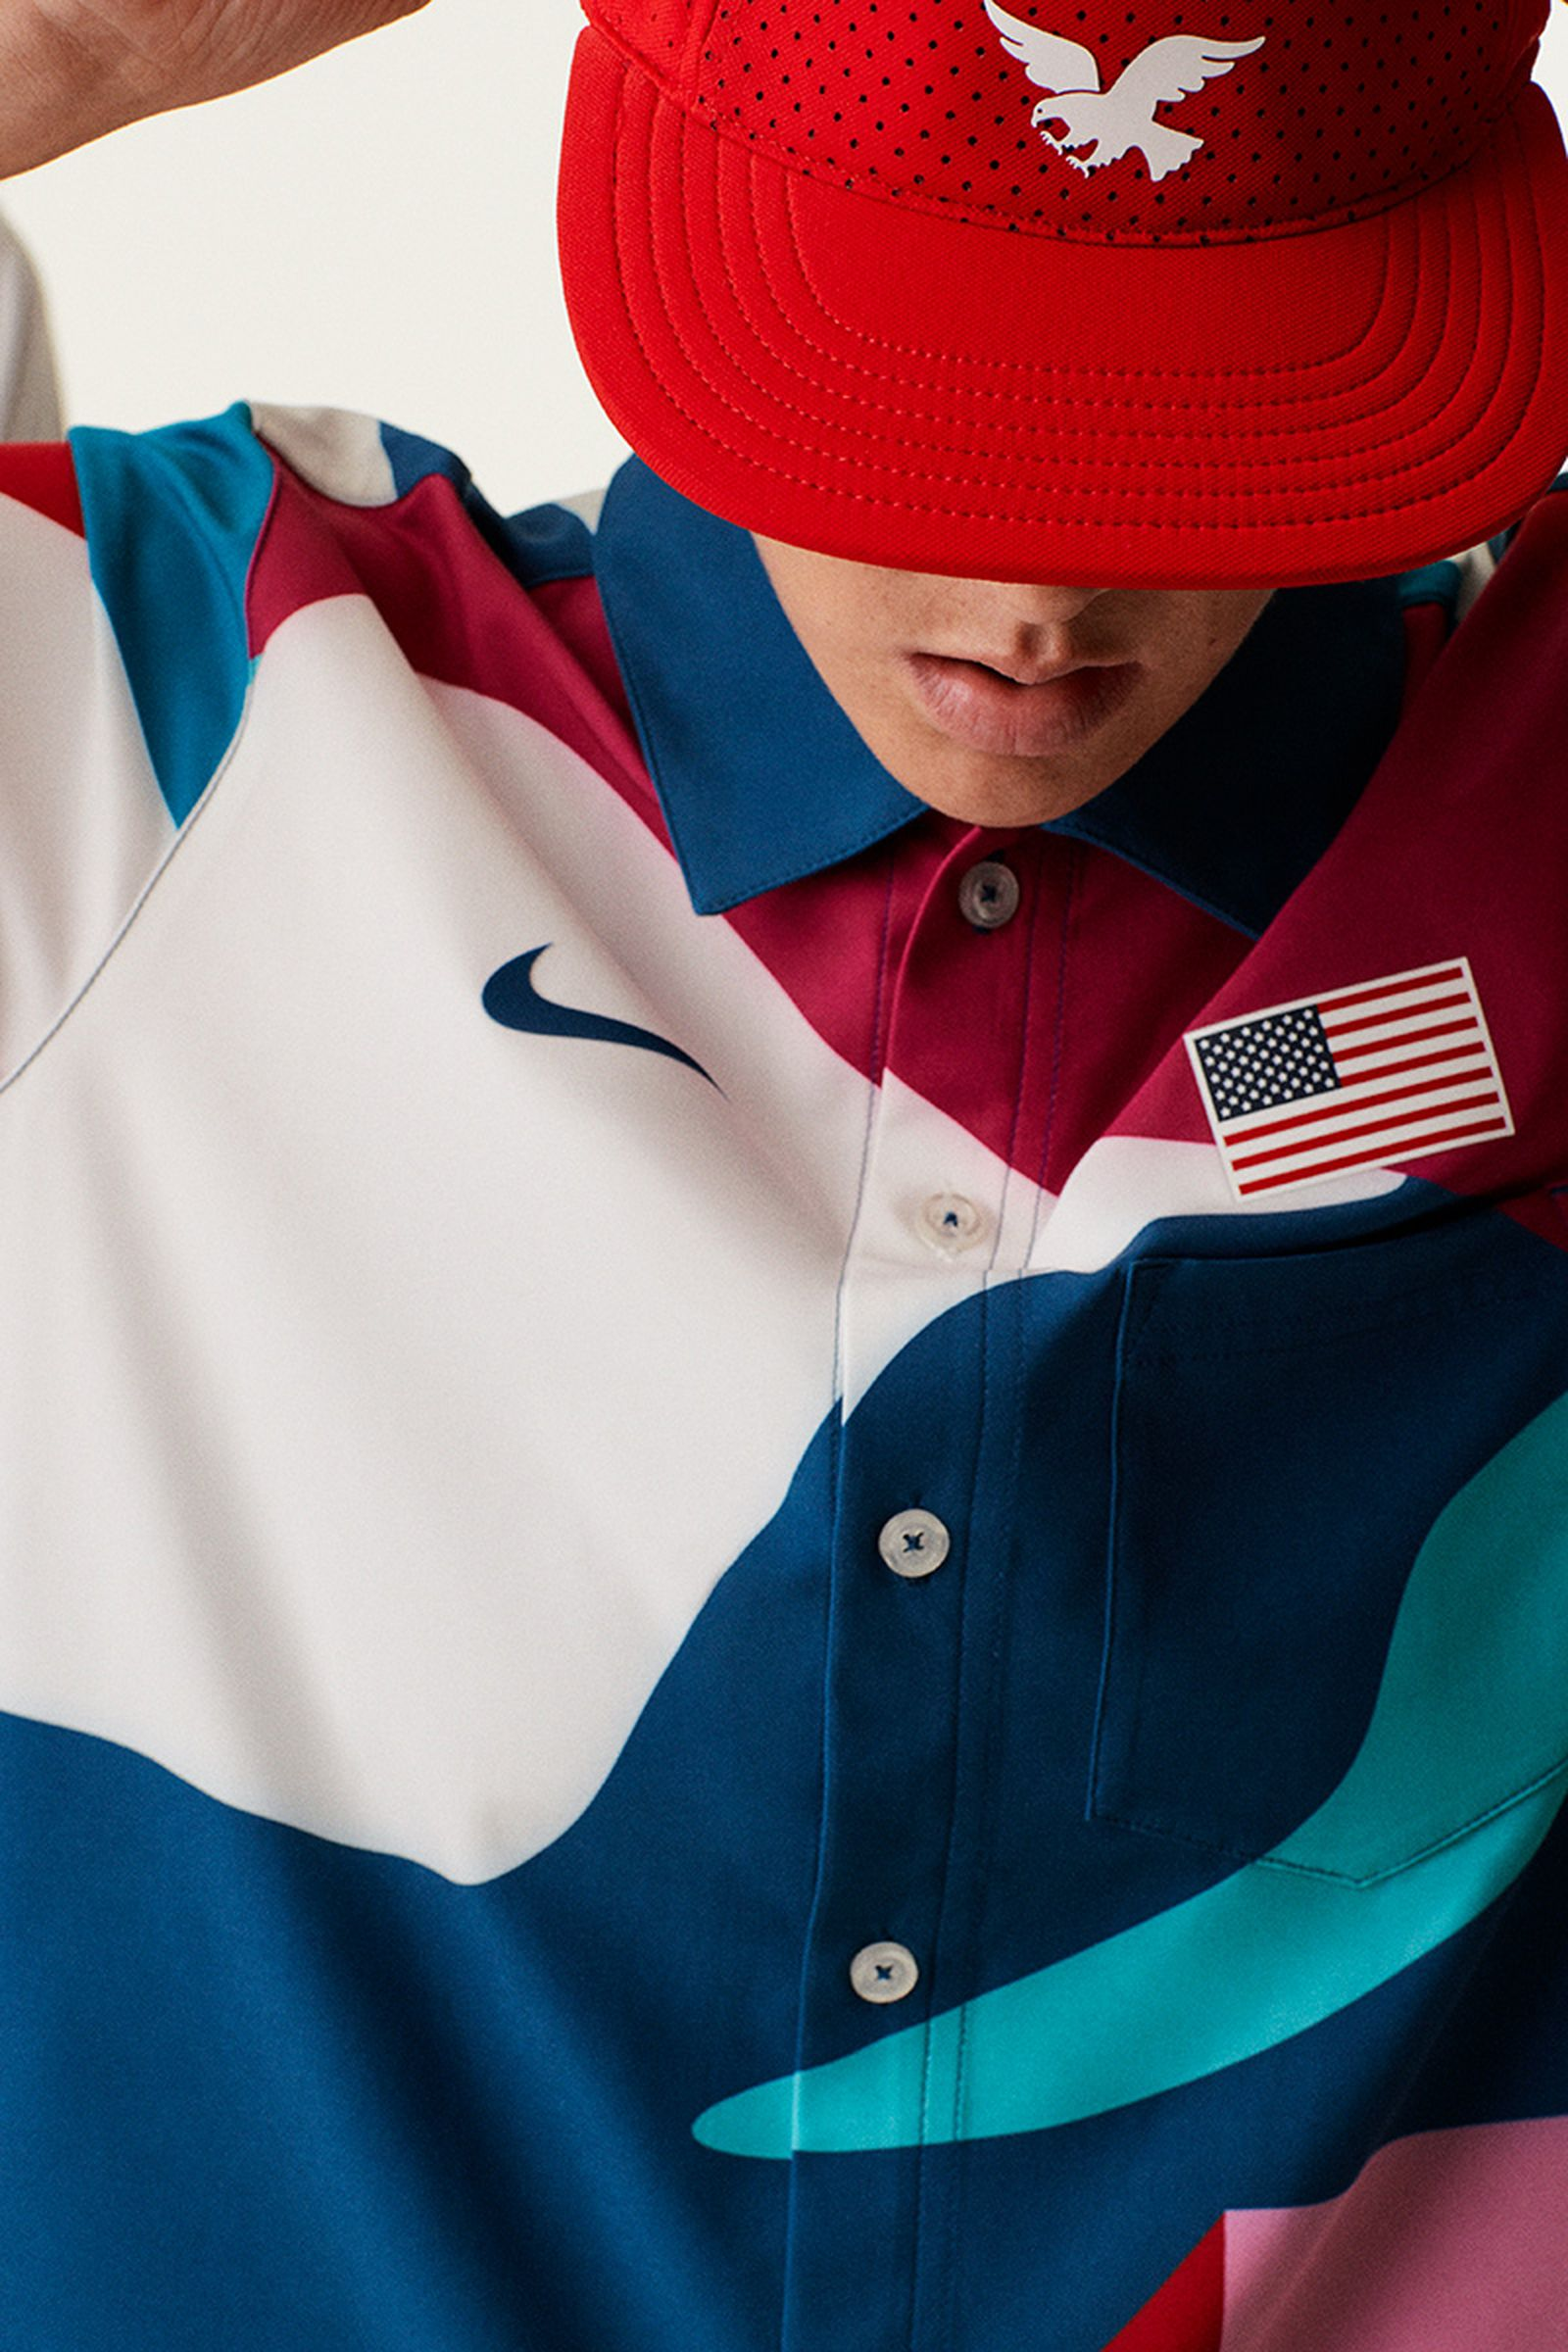 nike-sb-tokyo-olympics-skateboarding-uniforms-06